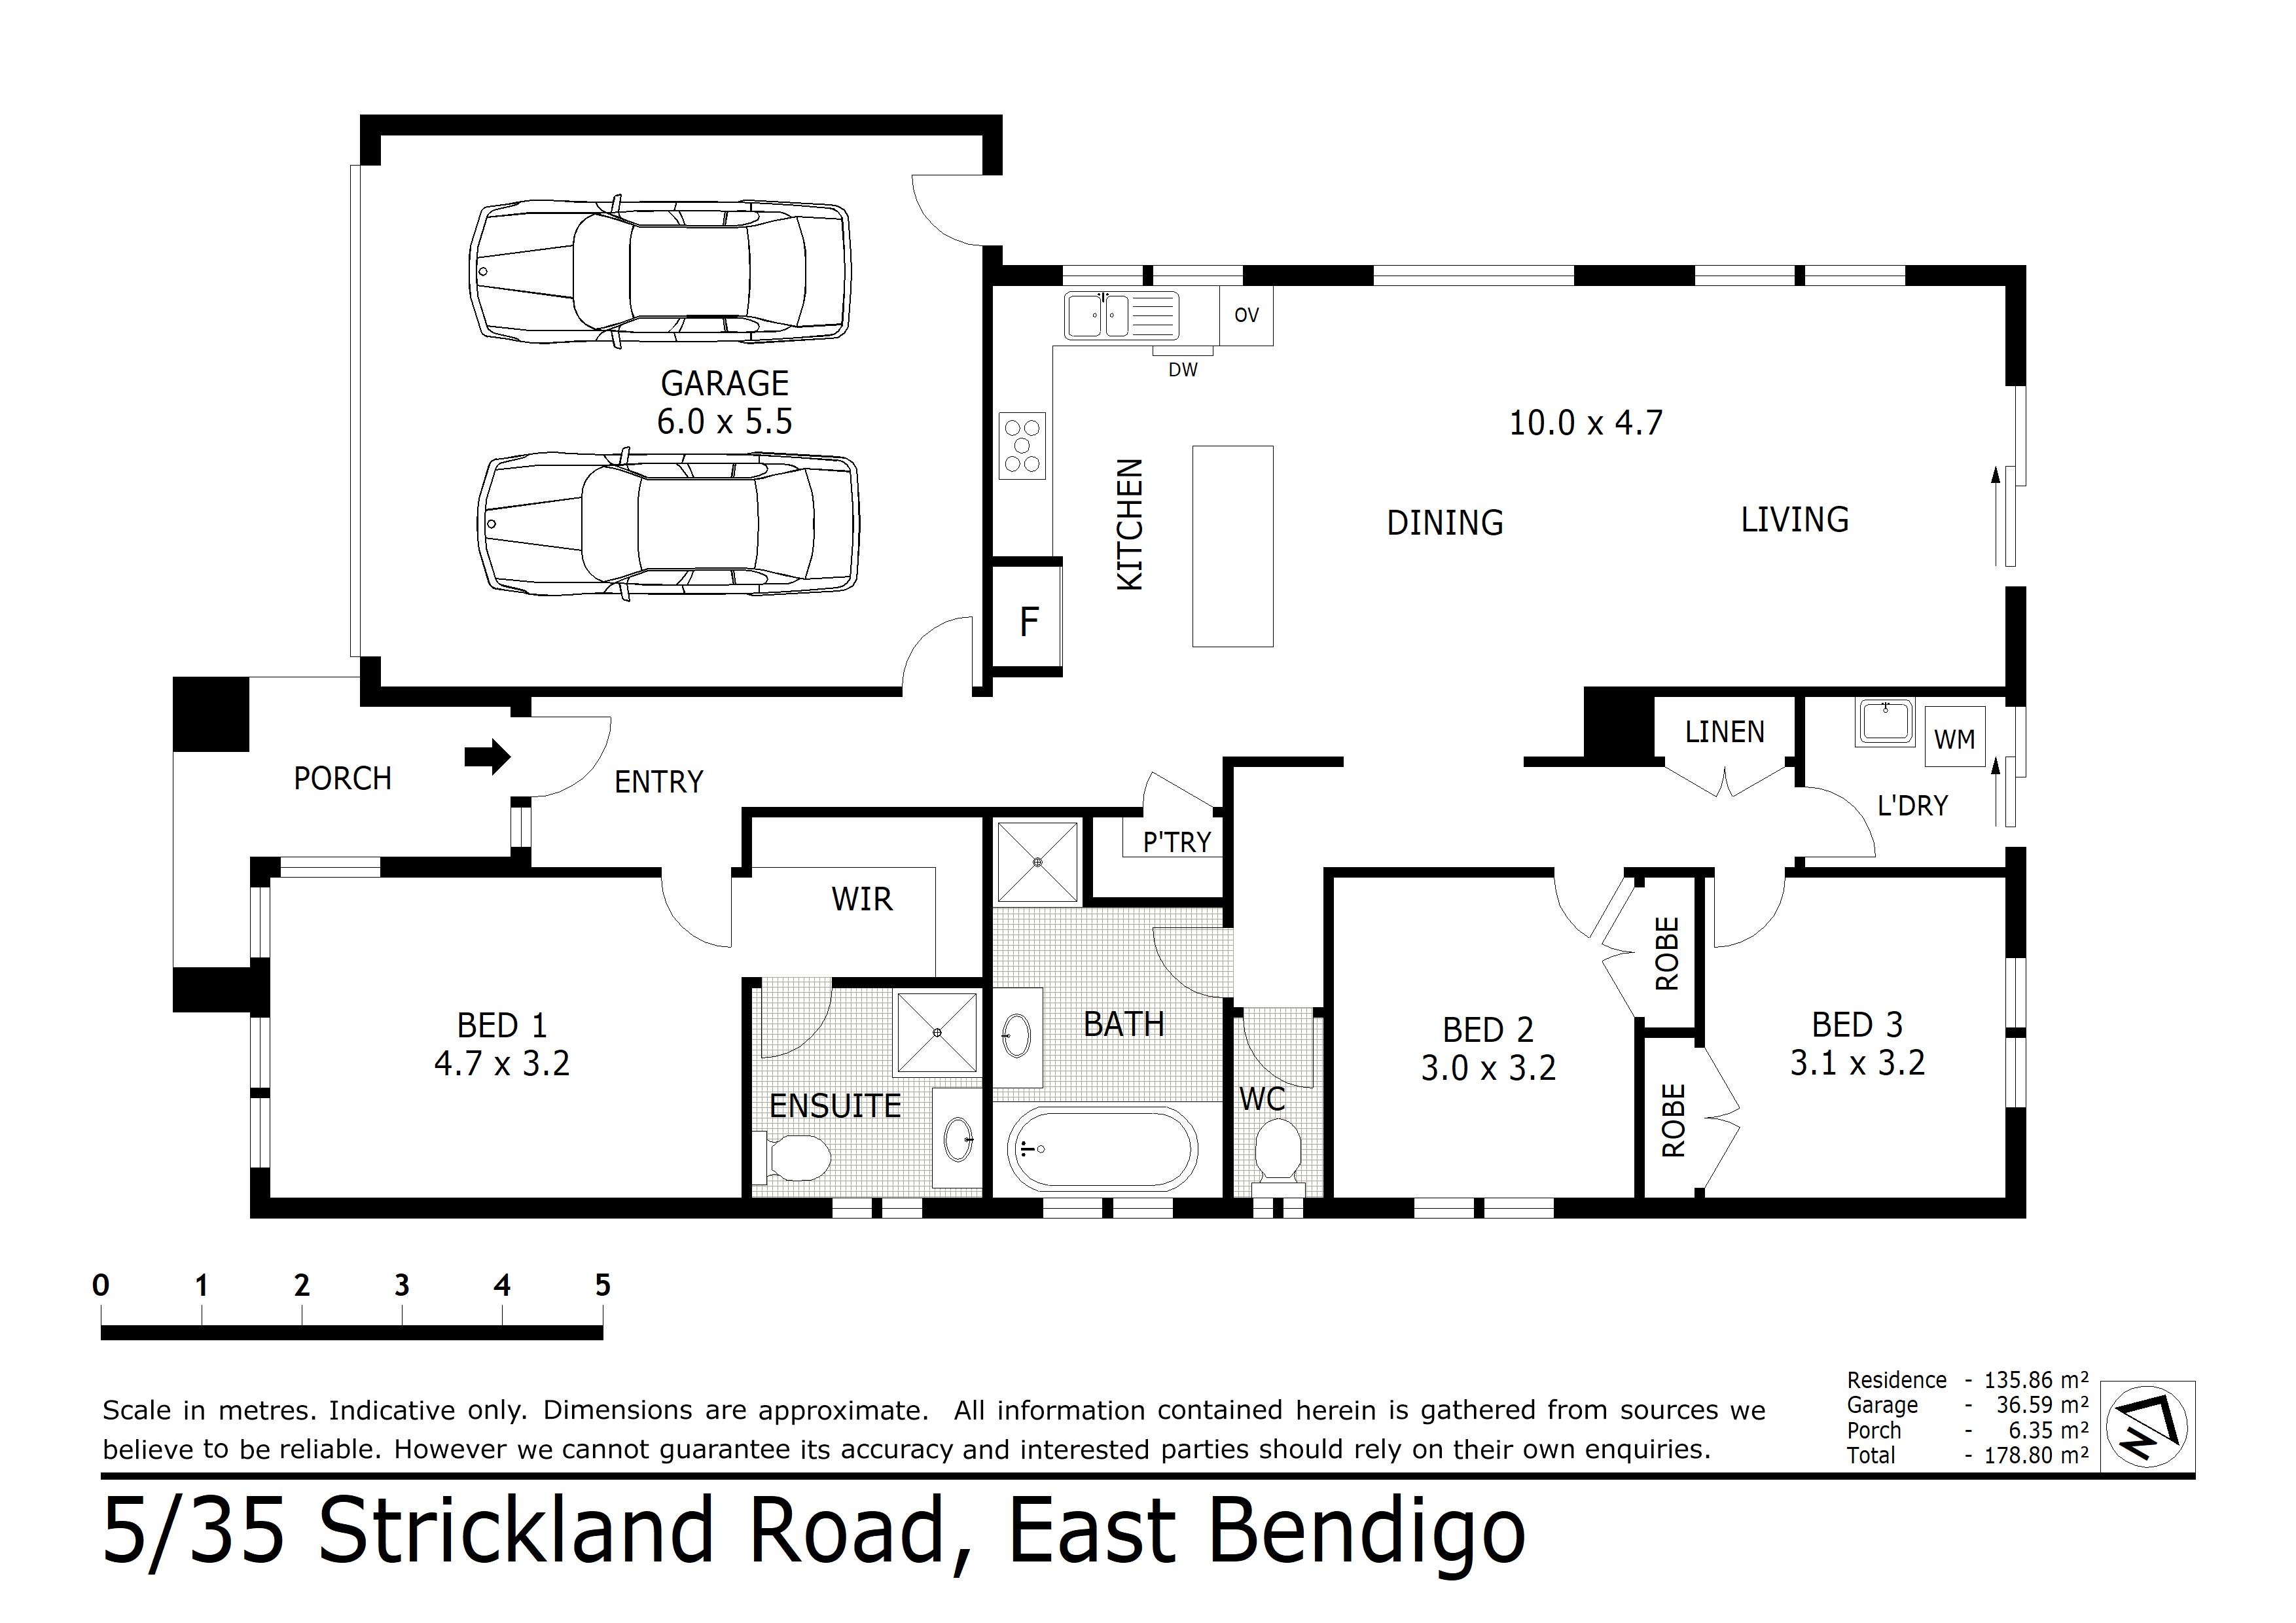 5/35 Strickland Road, East Bendigo, VIC 3550